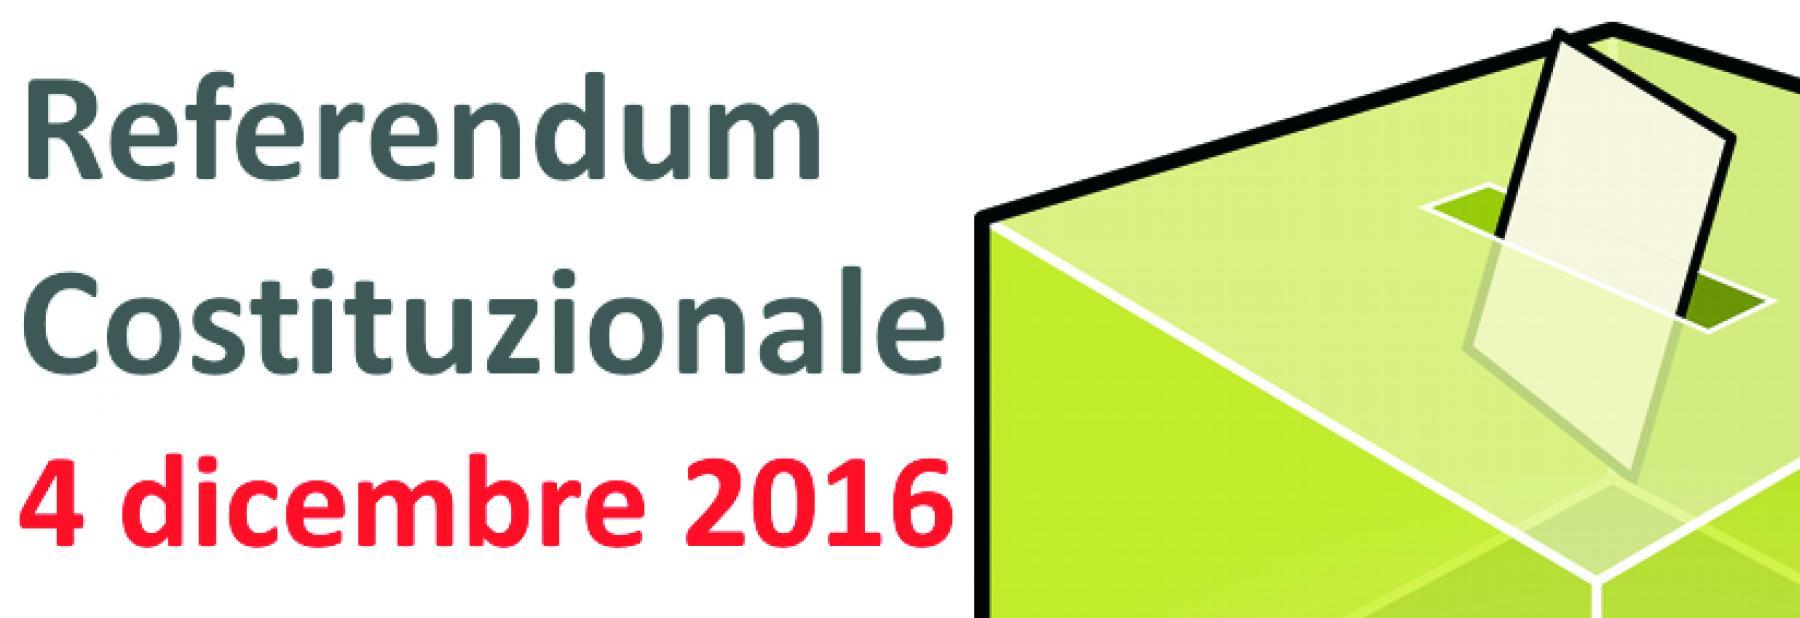 referendum_2016_12_04